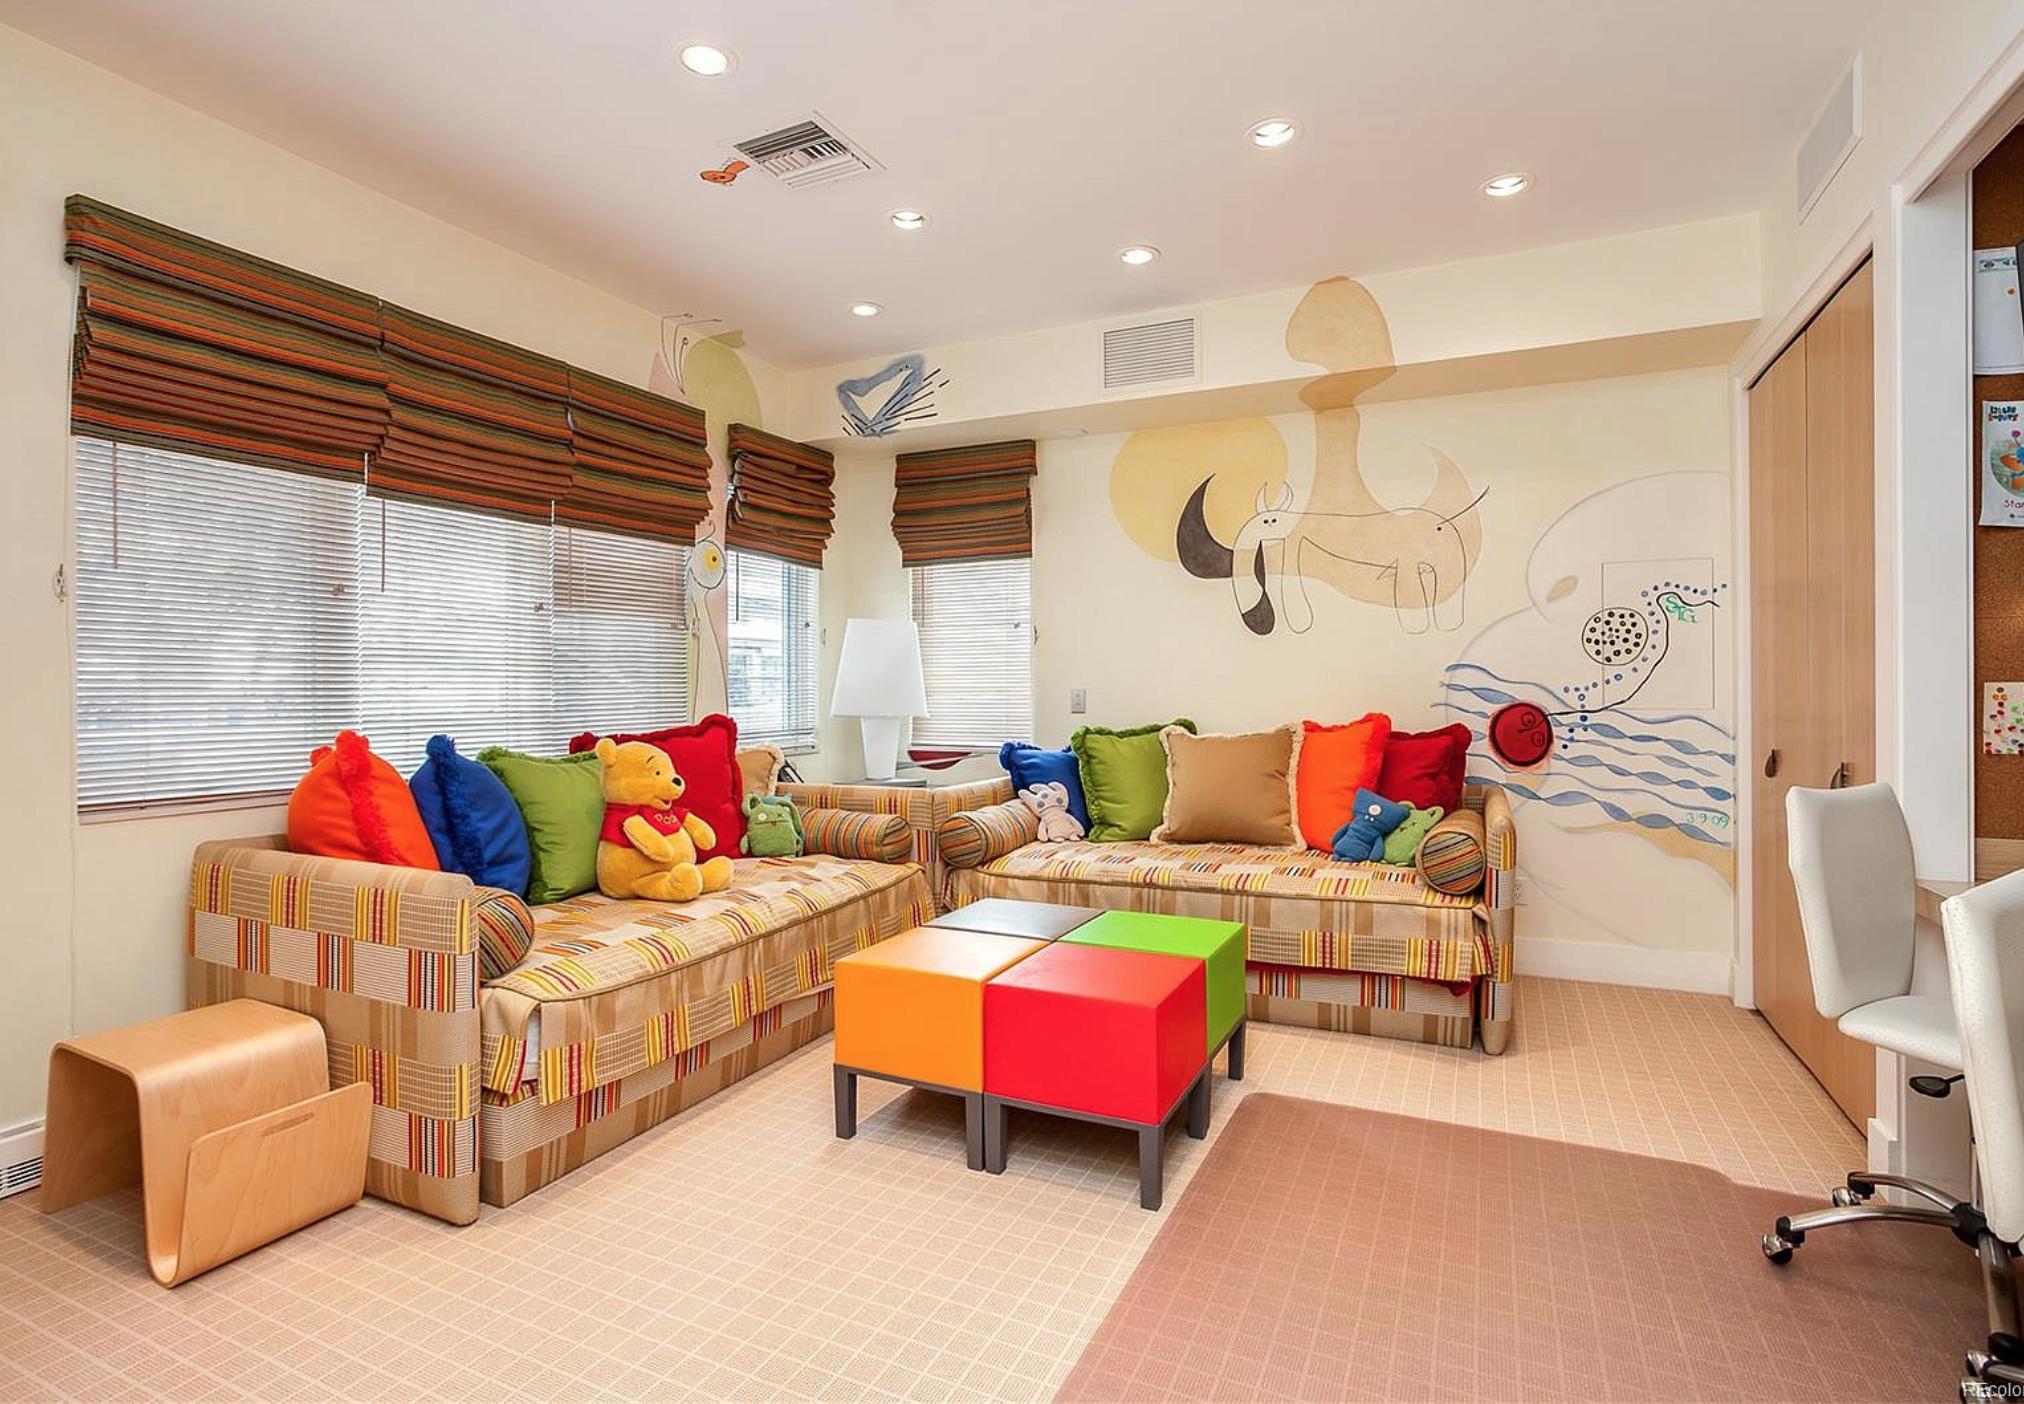 Playroom and yoga room